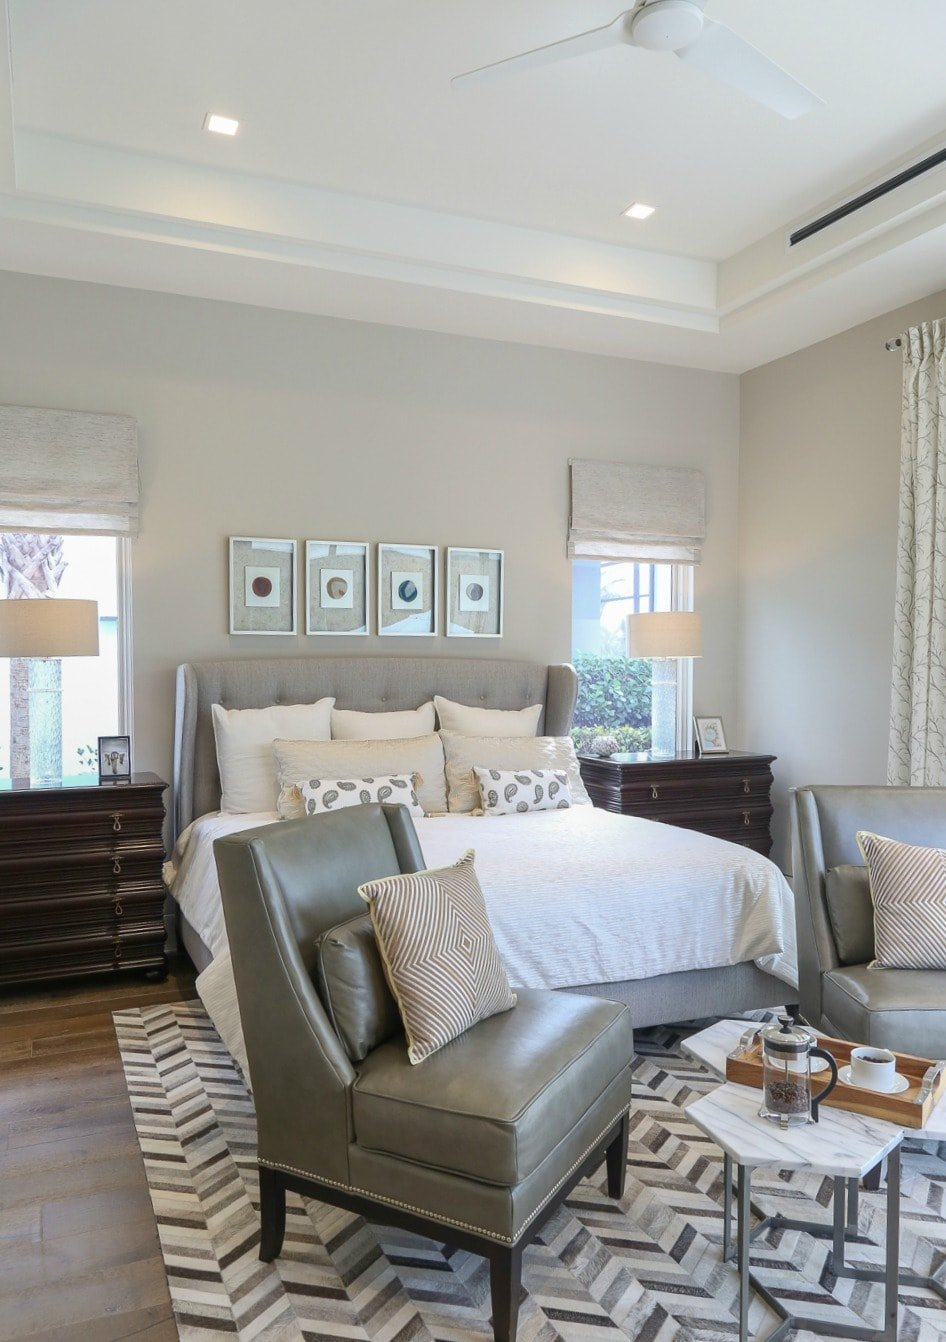 sherwin williams worldly gray bedroom walls